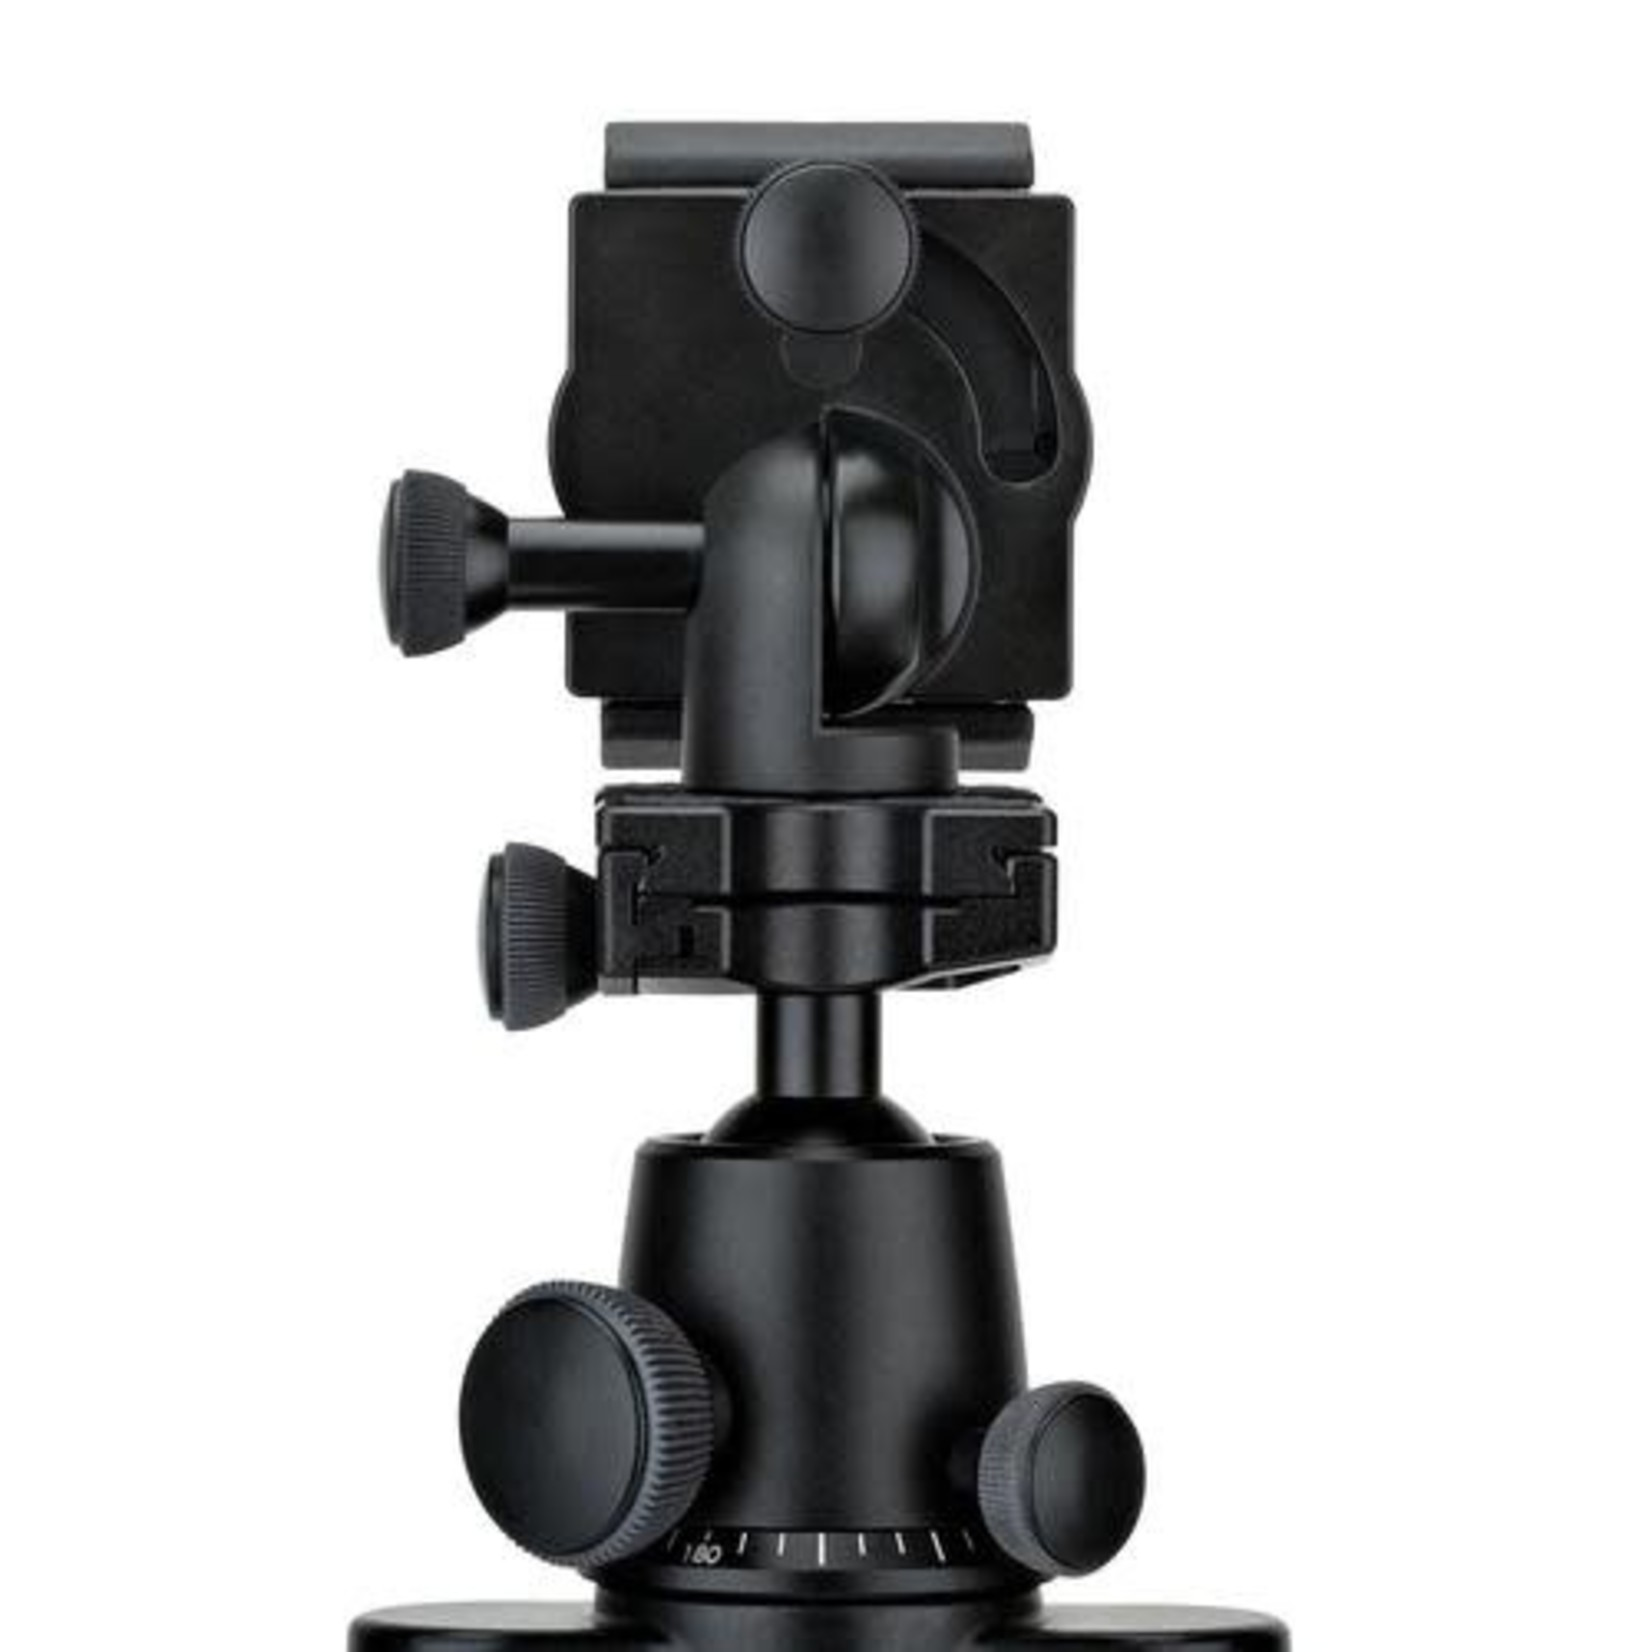 Joby JOBY GripTight PRO Smartphone Mount